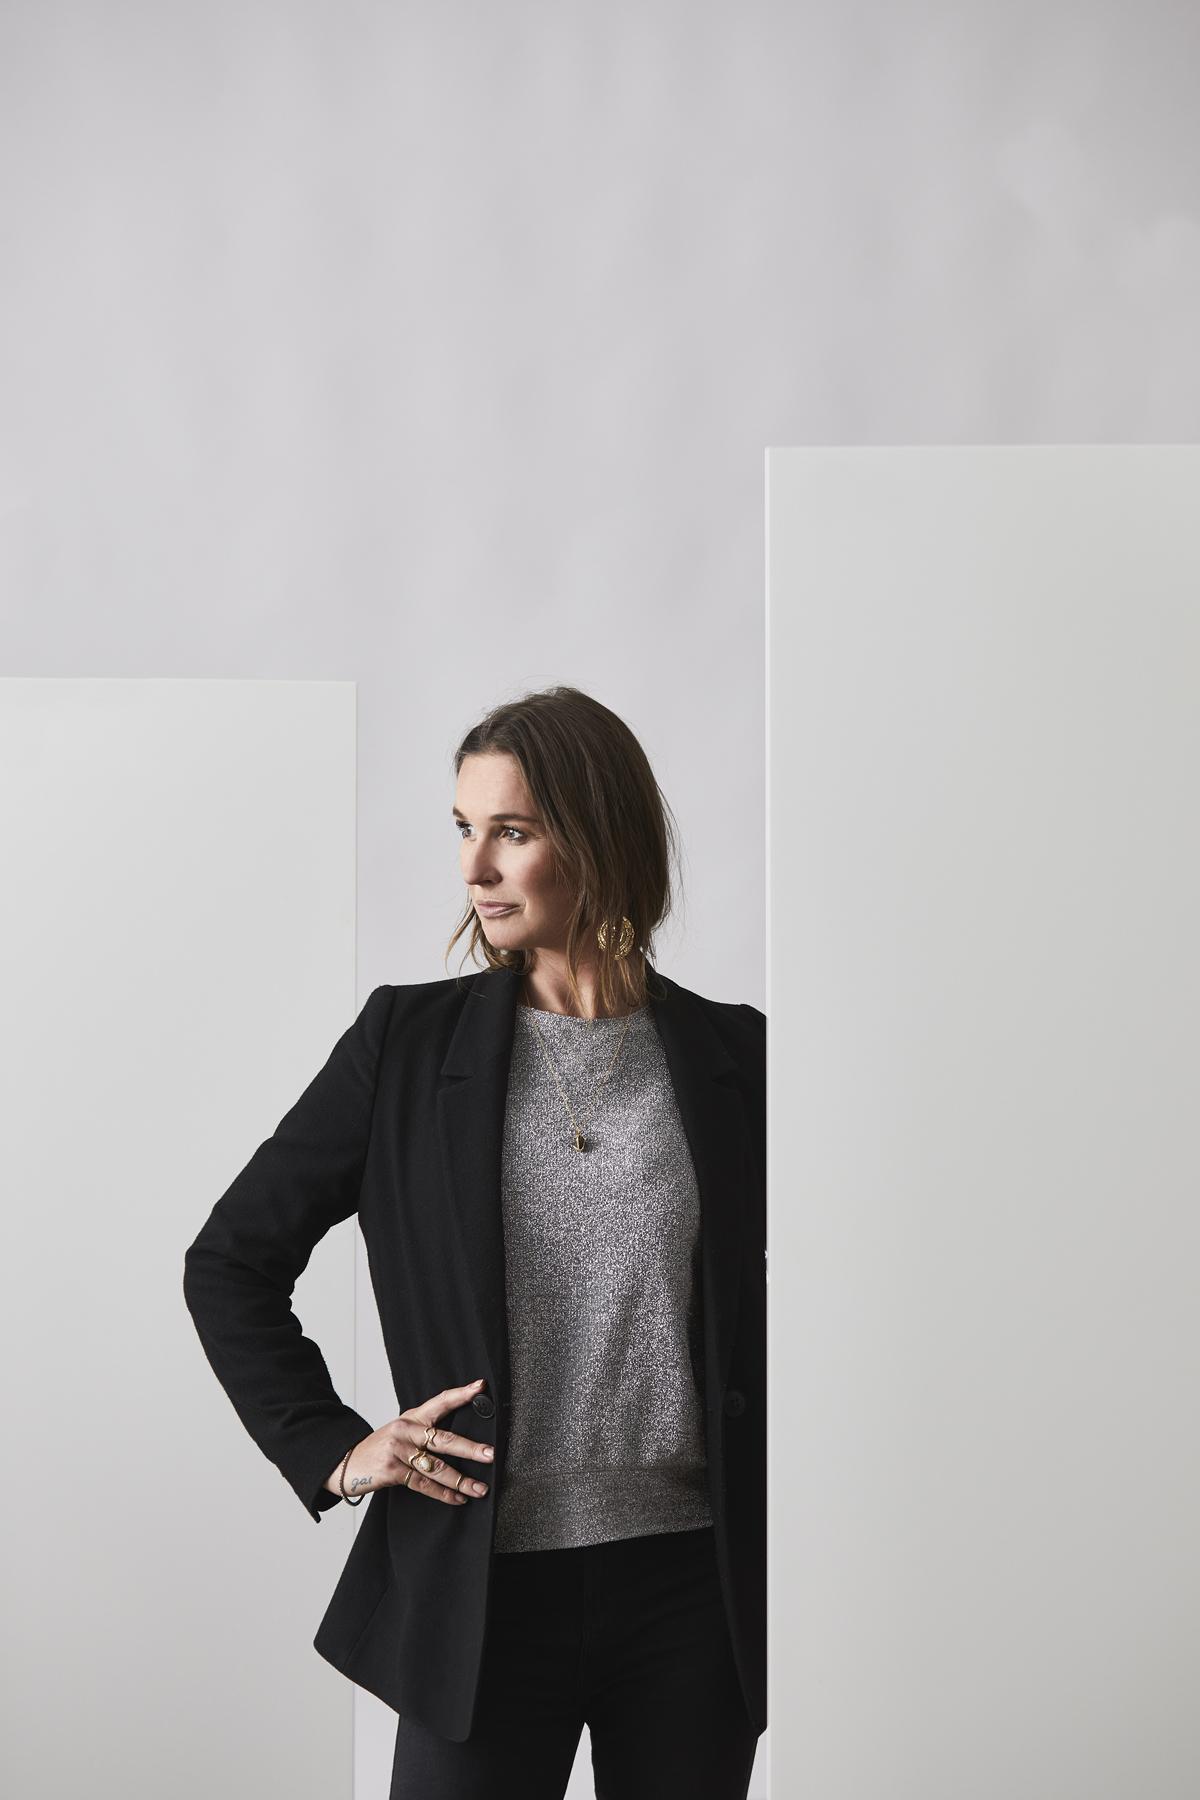 Founder Lisette Rützou